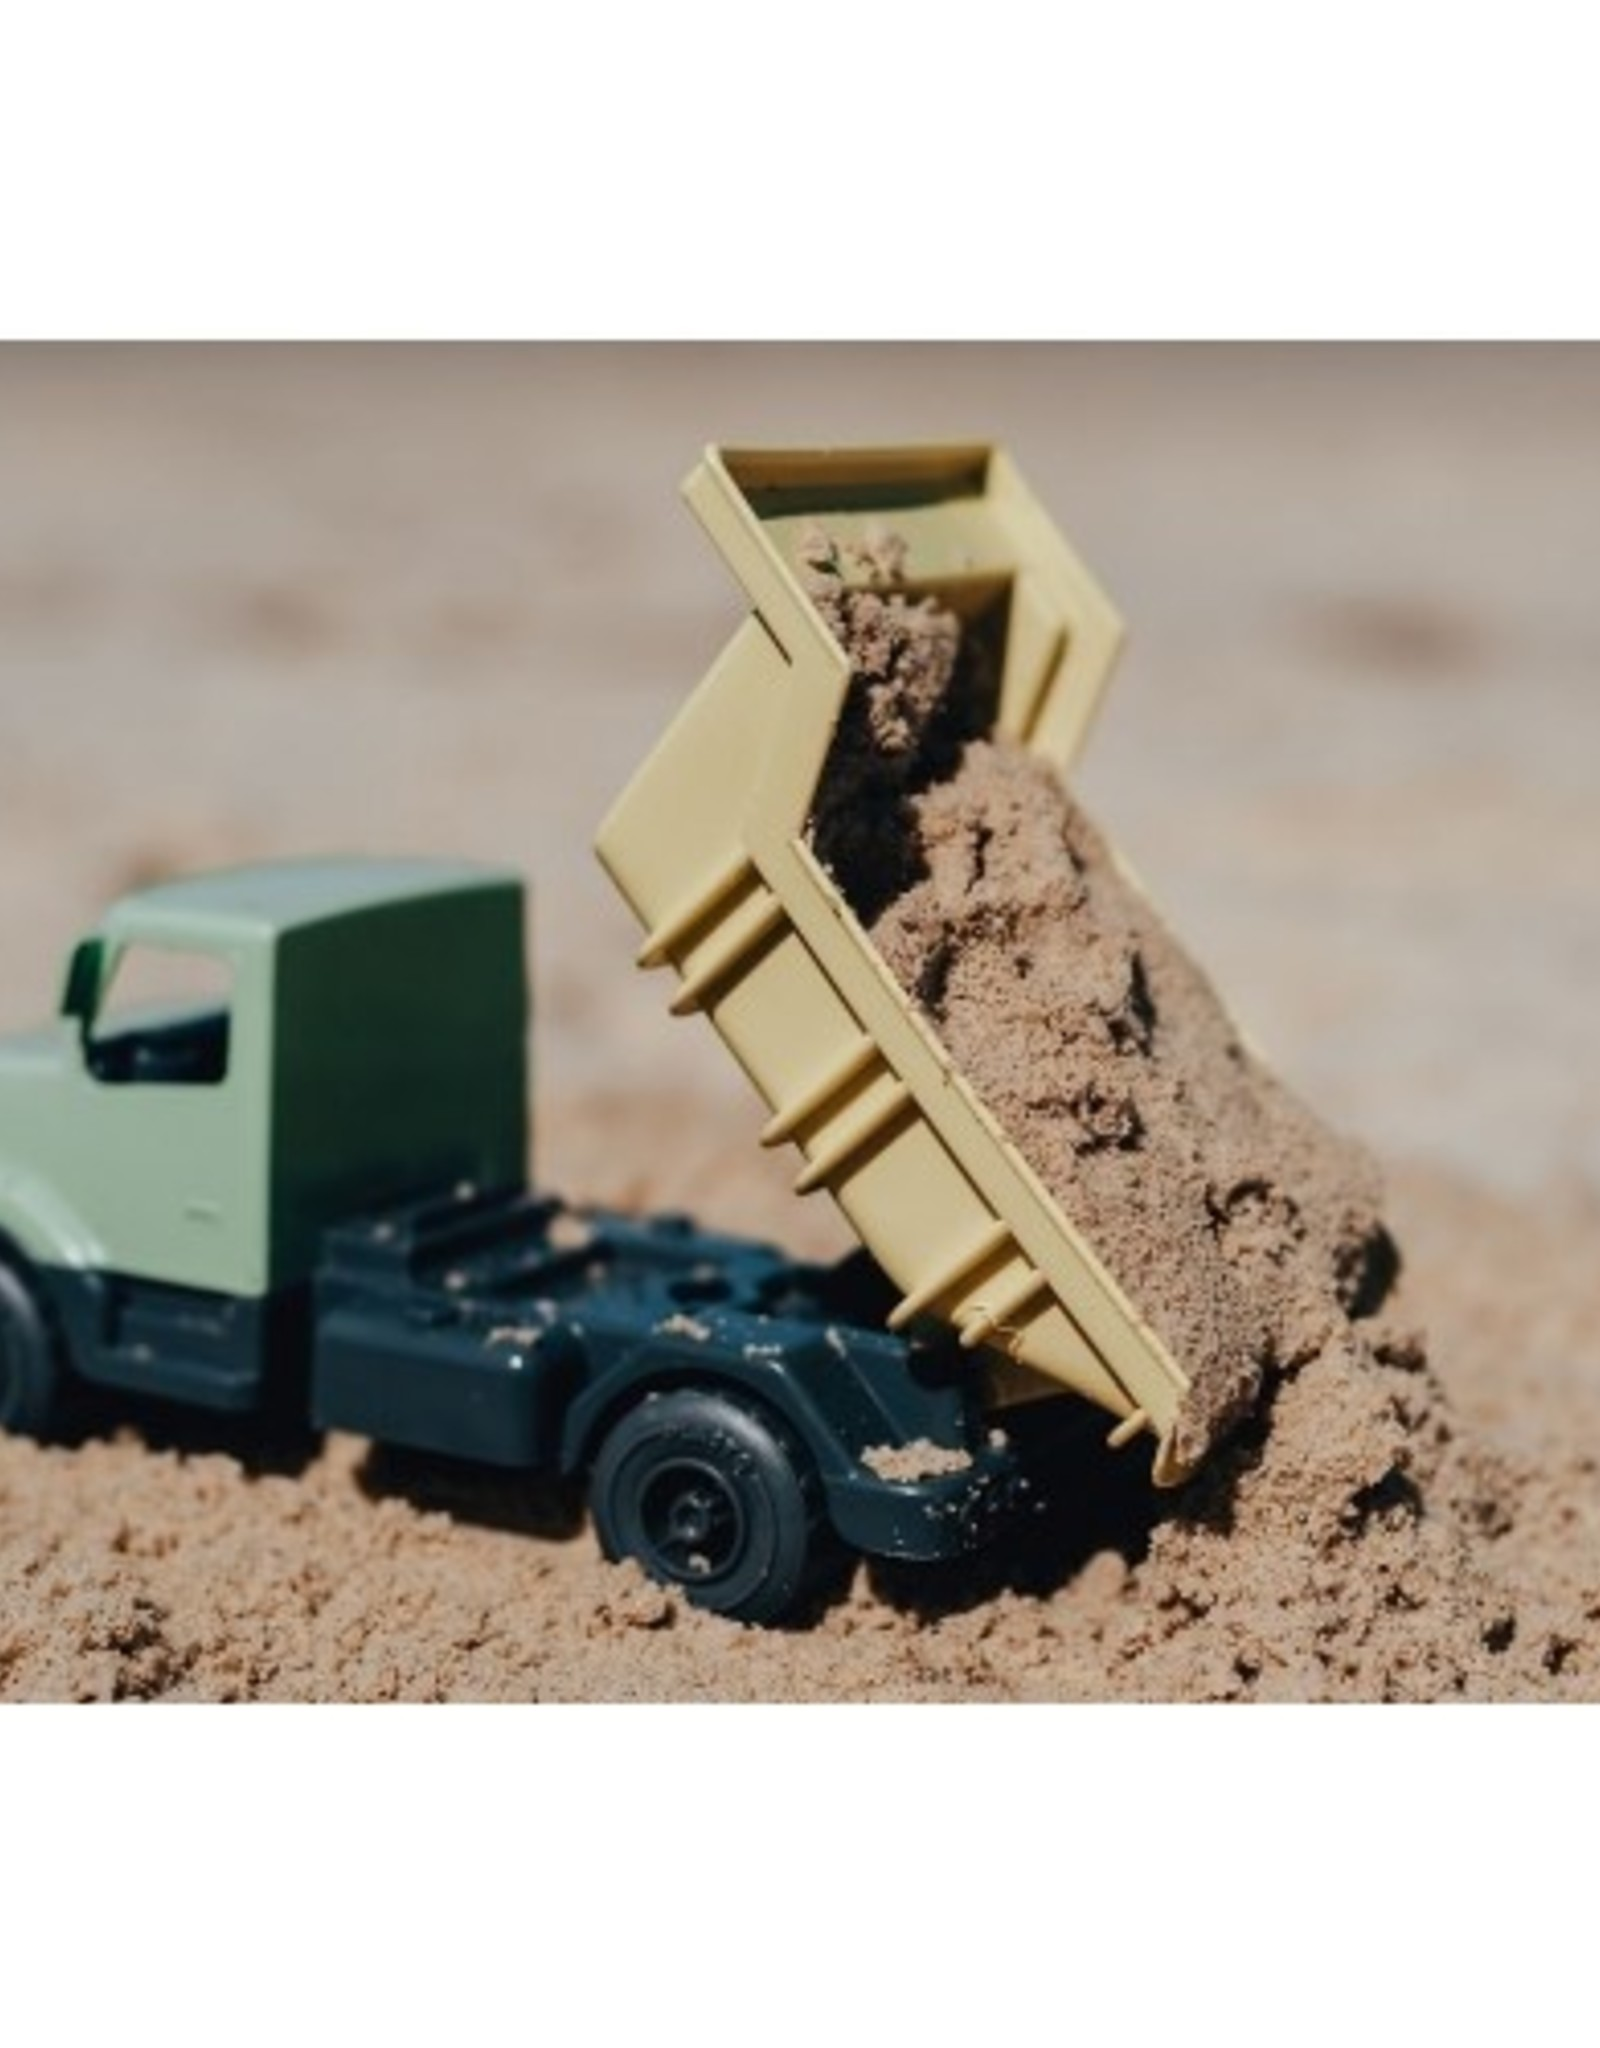 Plasto Plasto - I Am Green Tipper Truck